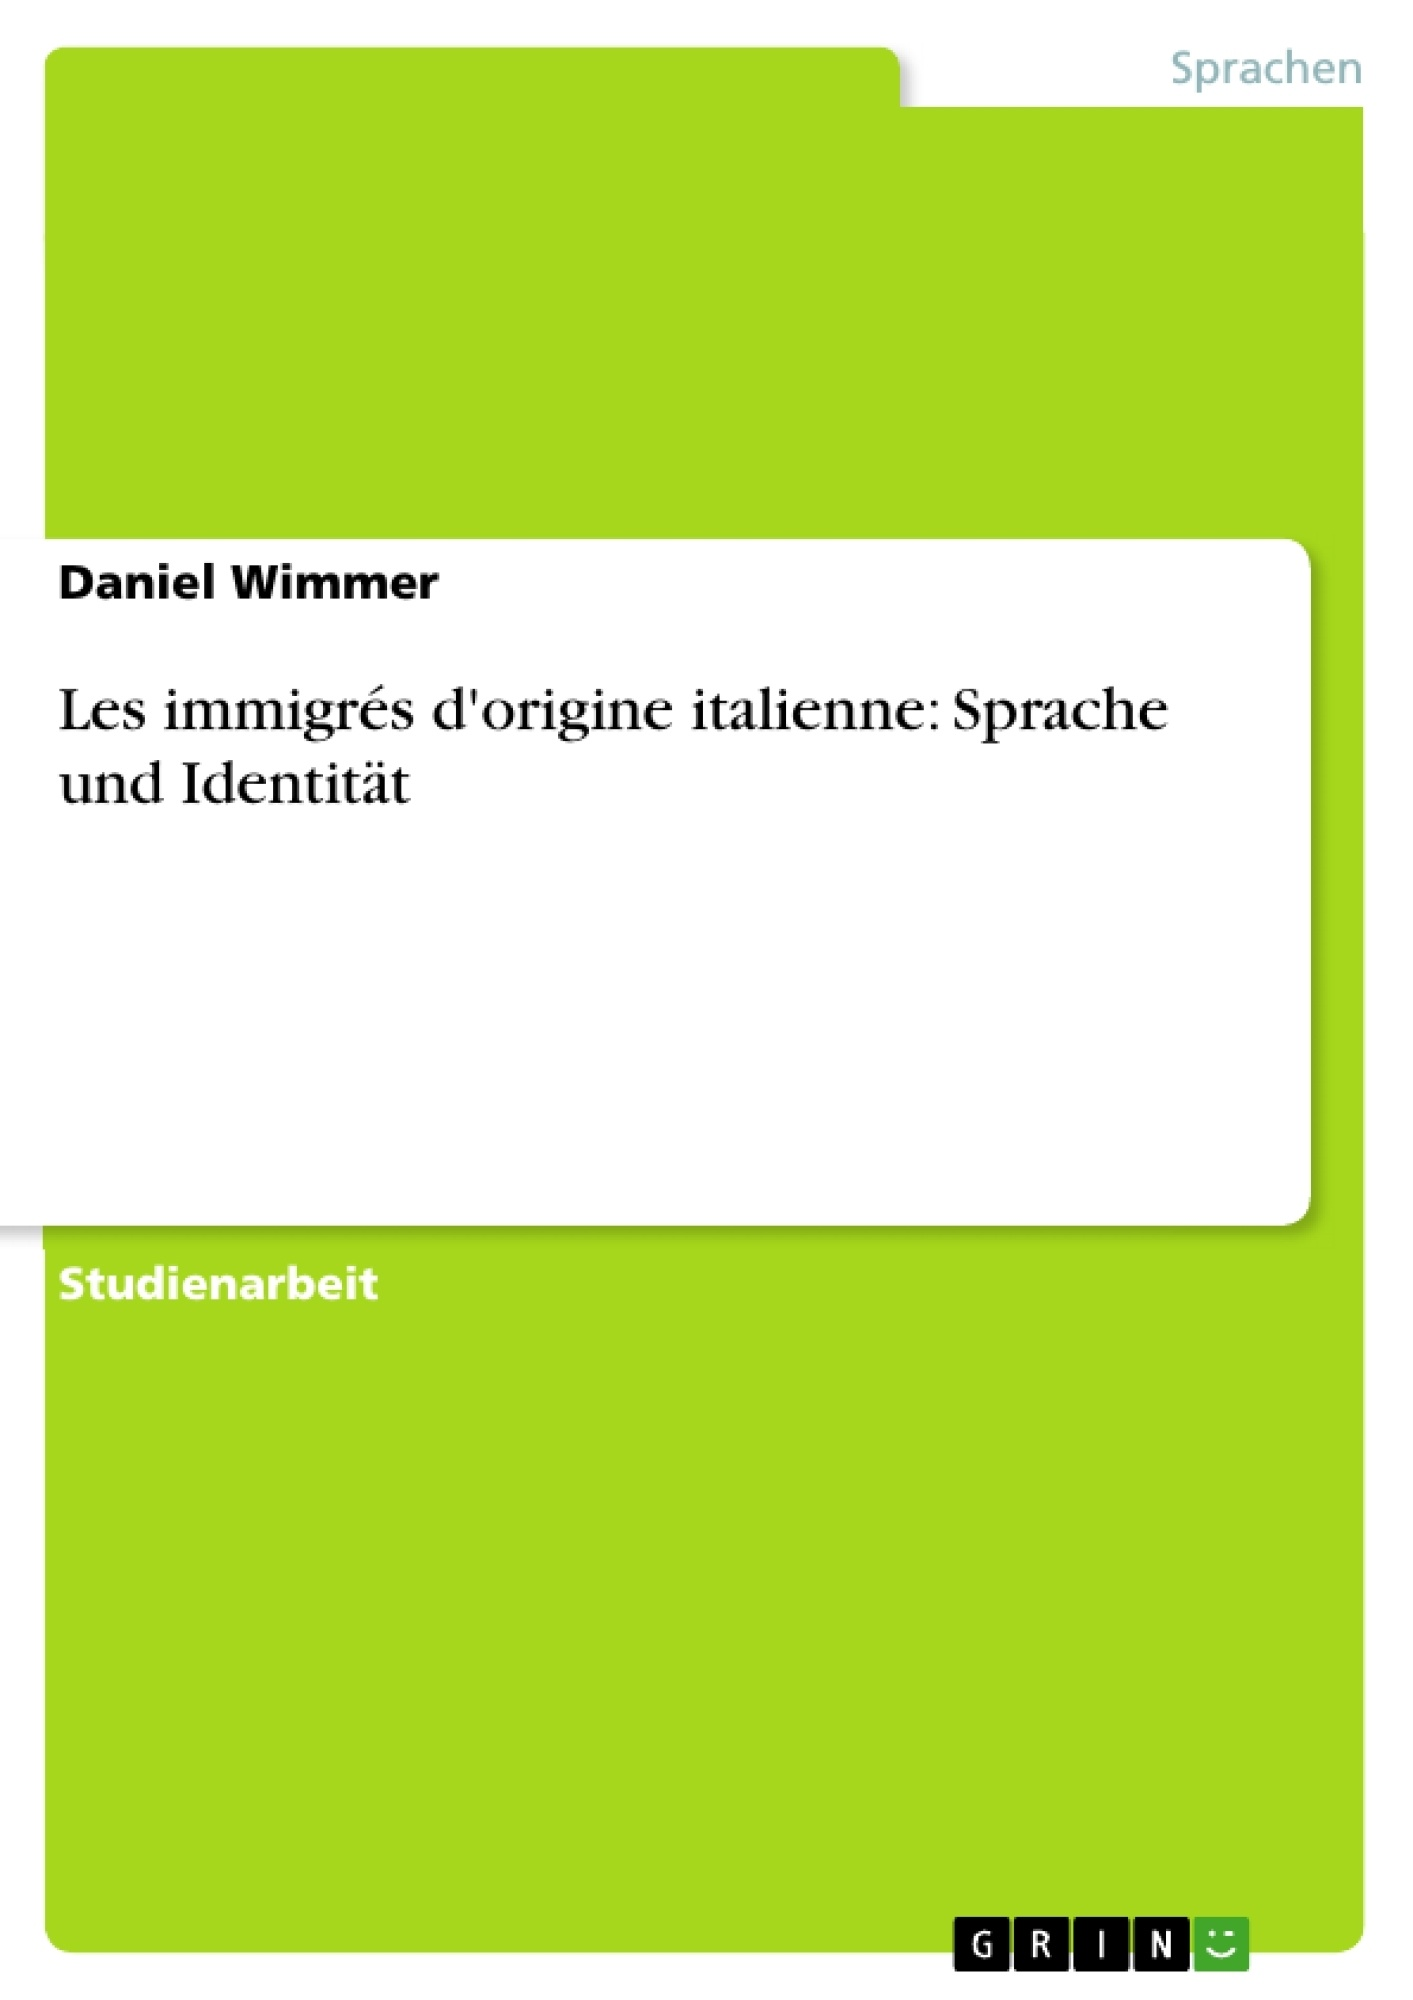 Titel: Les immigrés d'origine italienne: Sprache und Identität